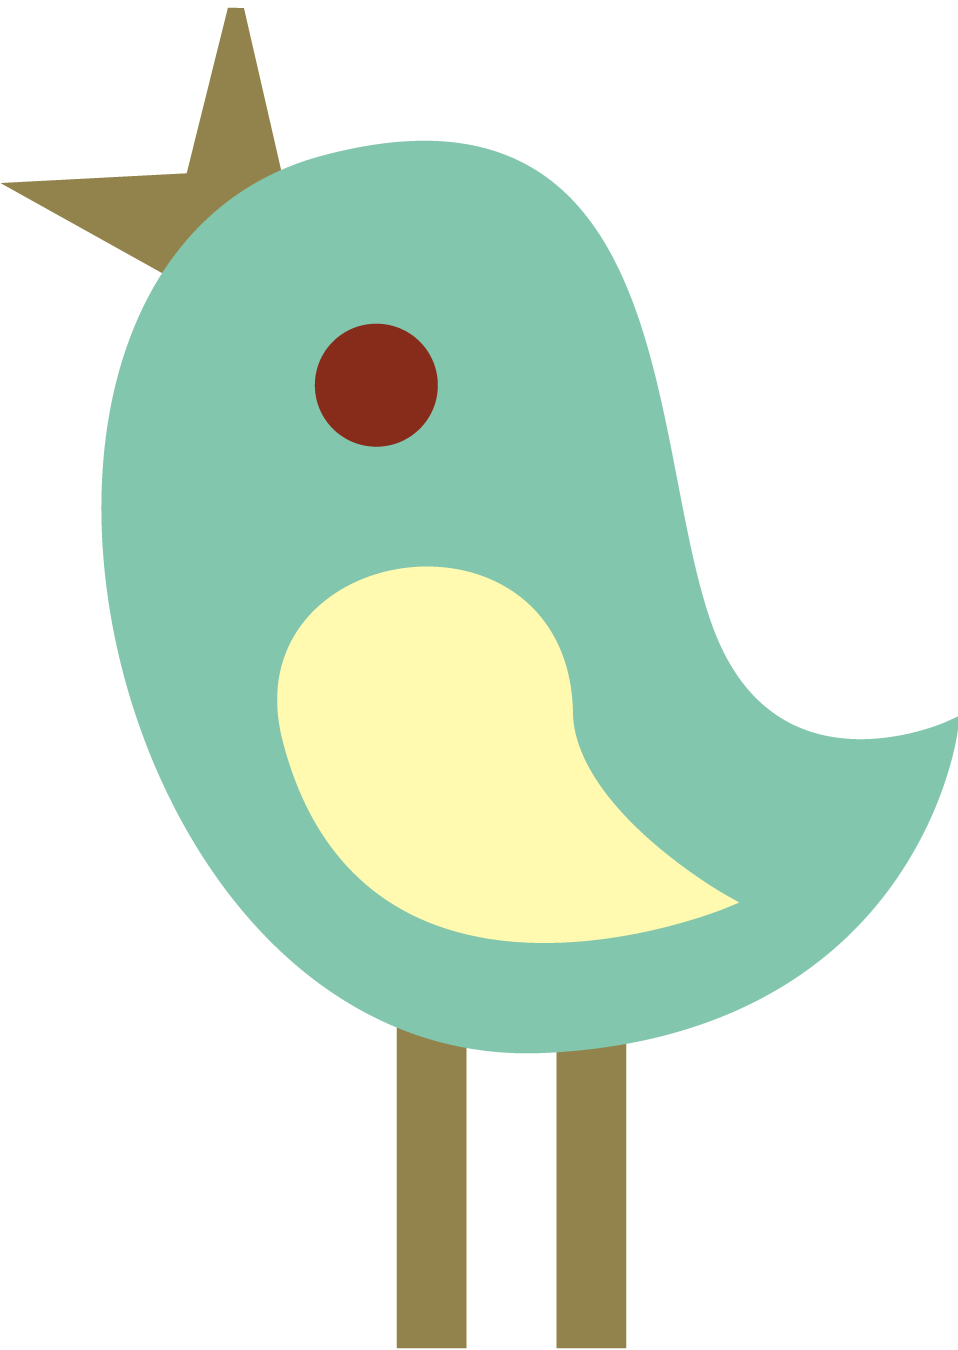 Cute Tweet Birds Clip Art Free Clipart G-Cute Tweet Birds Clip Art Free Clipart Graphics Revidevi Wordpress-15